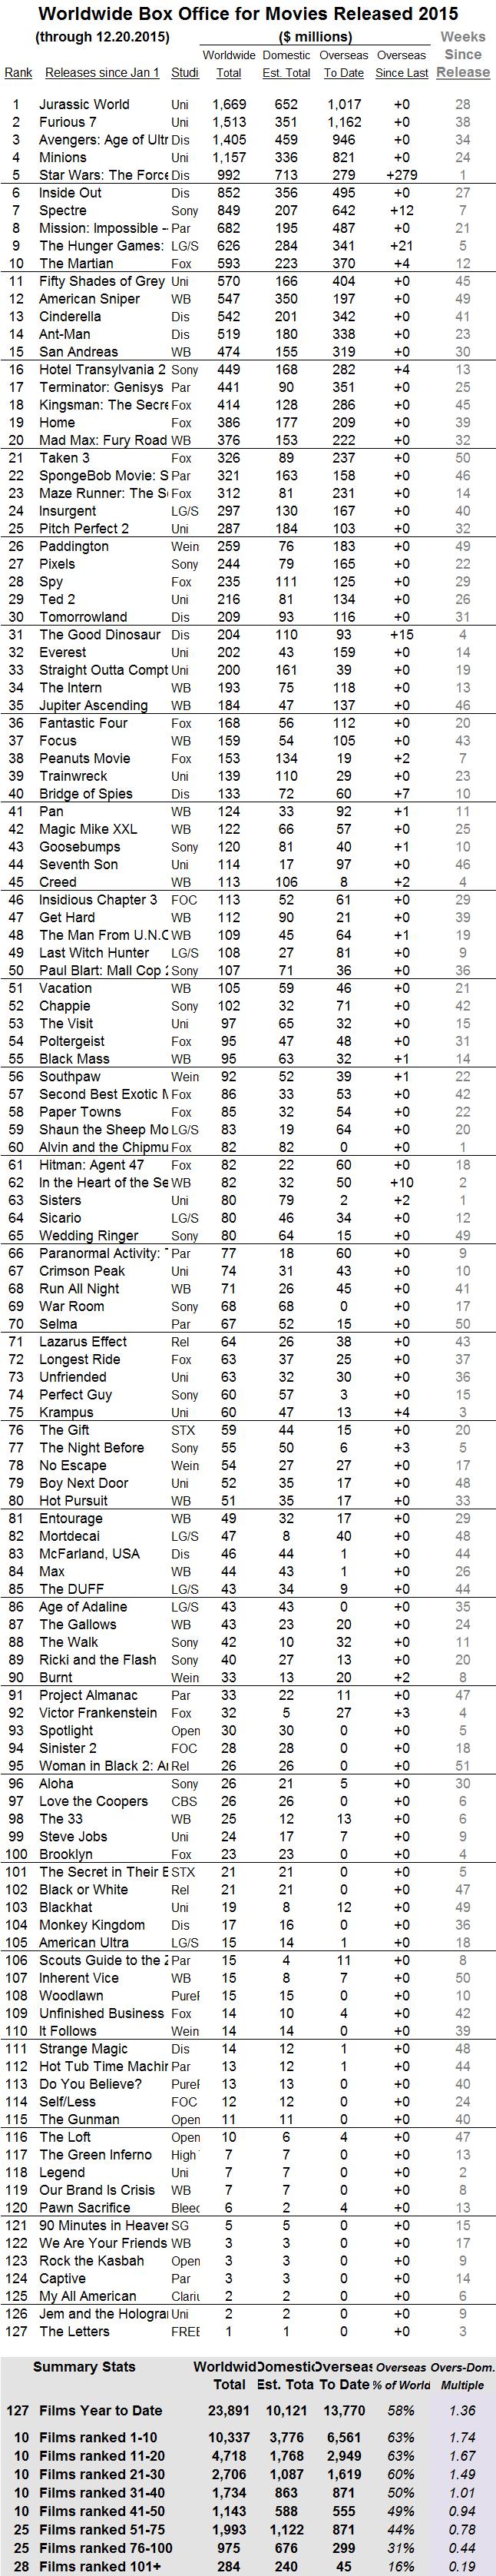 International 2015 through 2015 Dec 20